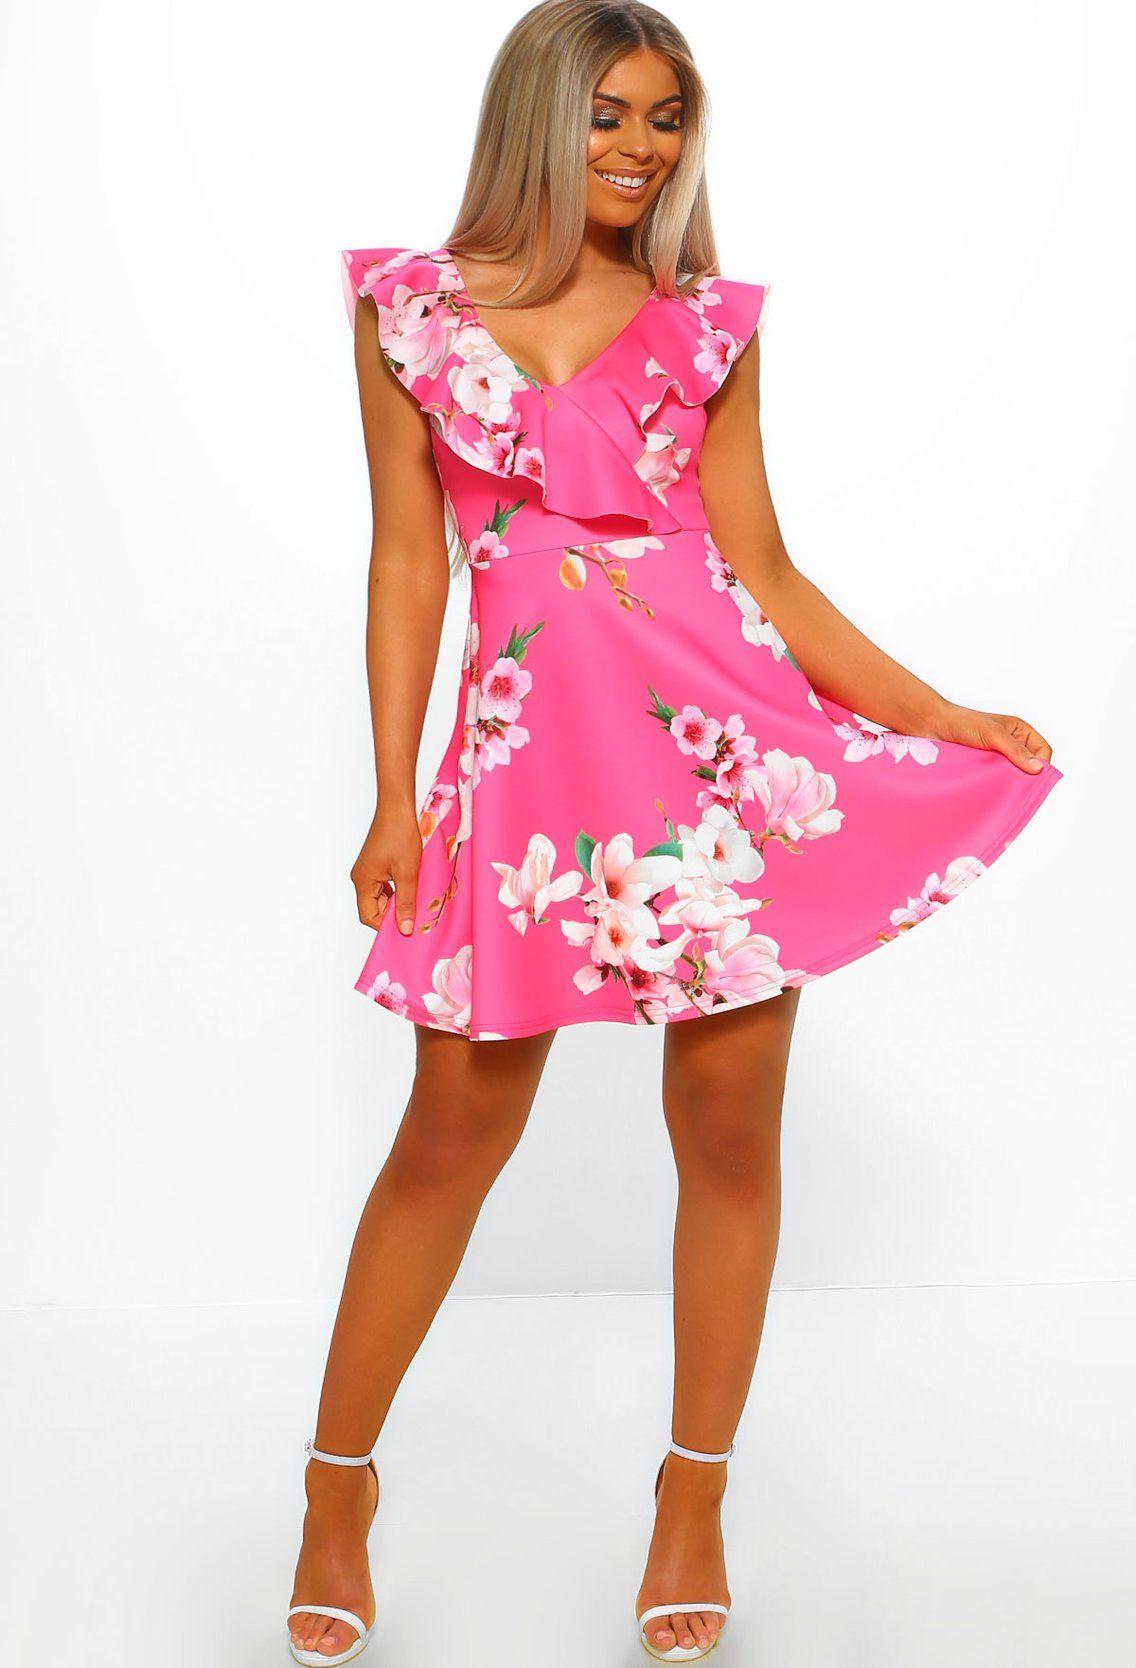 Hamptons party pink floral frill skater dress 8